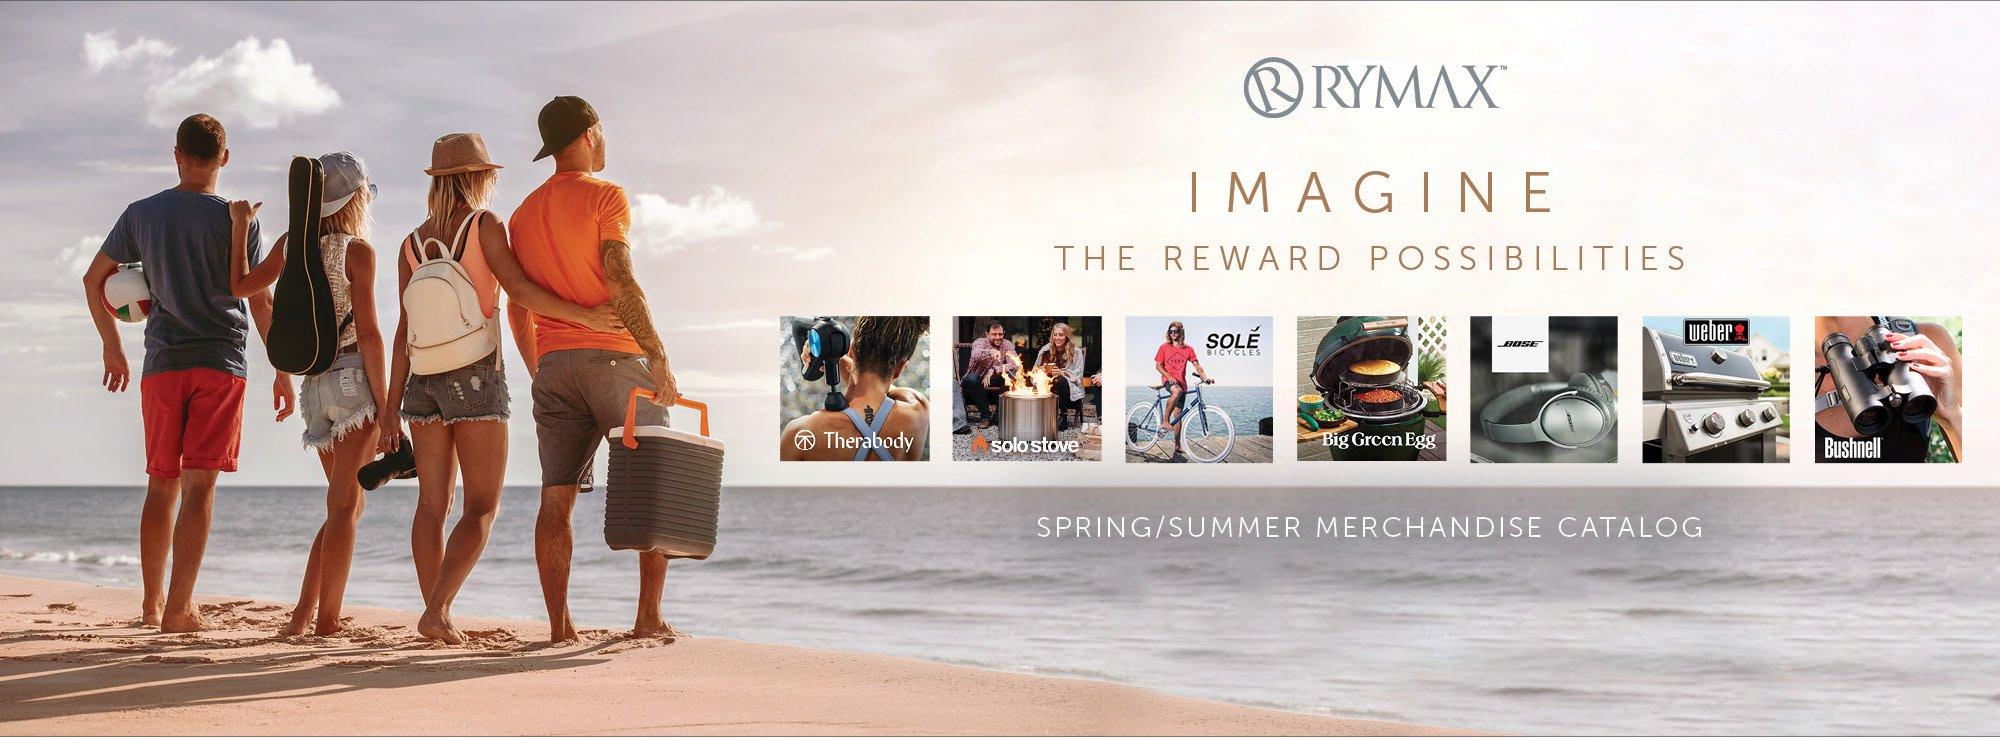 Spring/Summer 2021 Merchandise Catalog